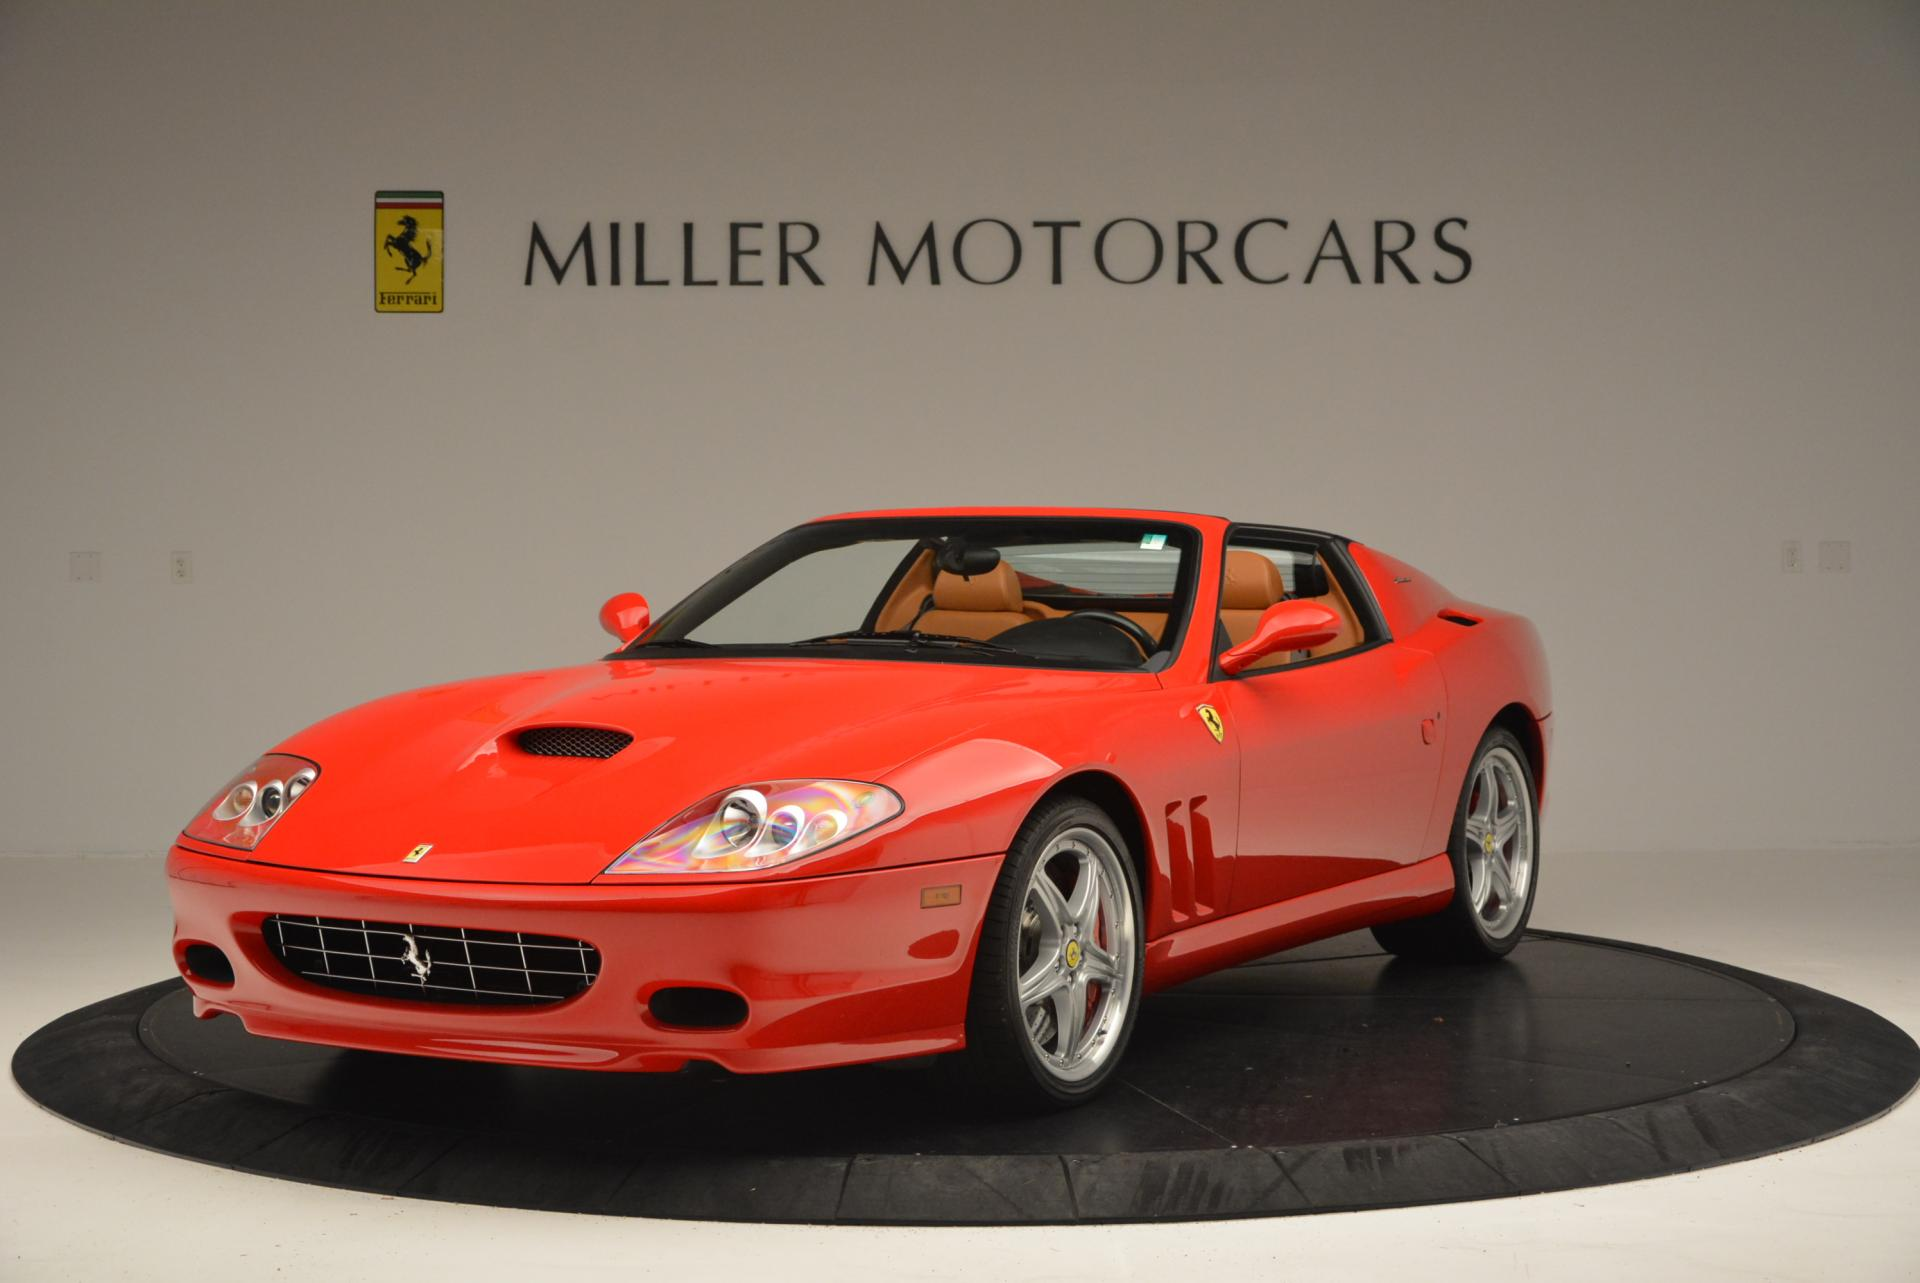 Used 2005 Ferrari Superamerica for sale Sold at Maserati of Greenwich in Greenwich CT 06830 1